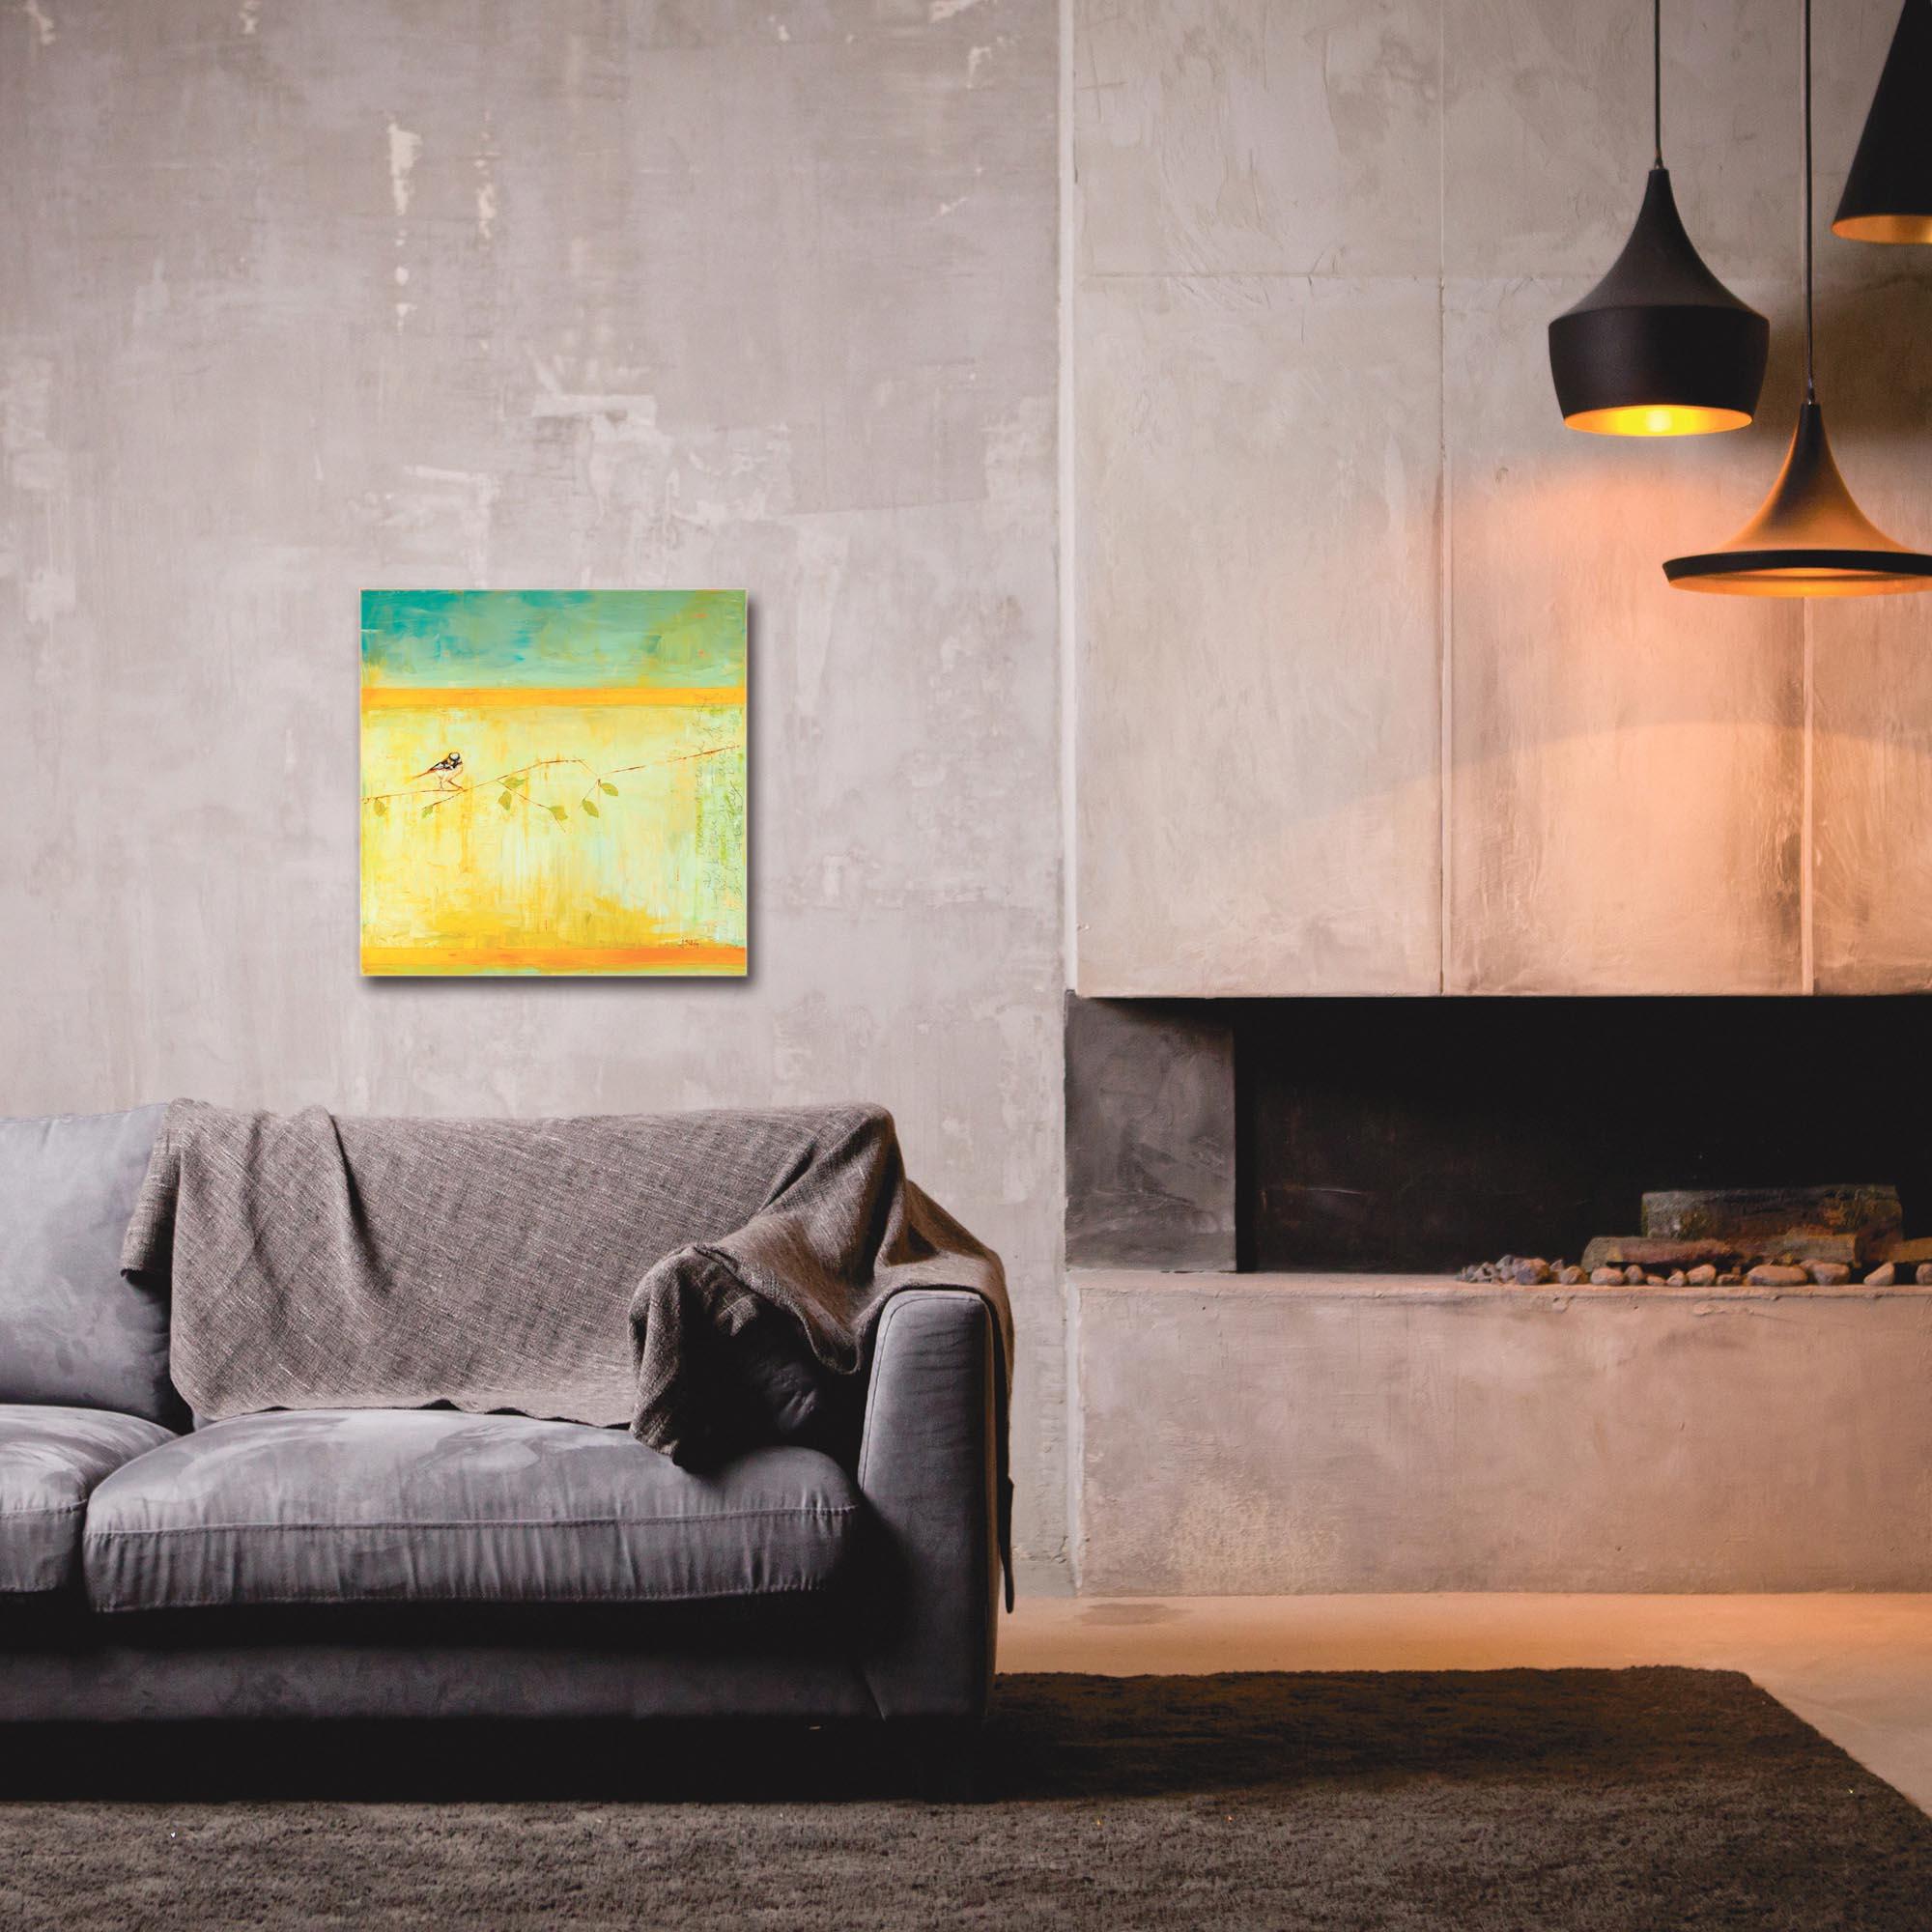 Contemporary Wall Art 'Bird with Horizontal Stripes' - Urban Birds Decor on Metal or Plexiglass - Image 3